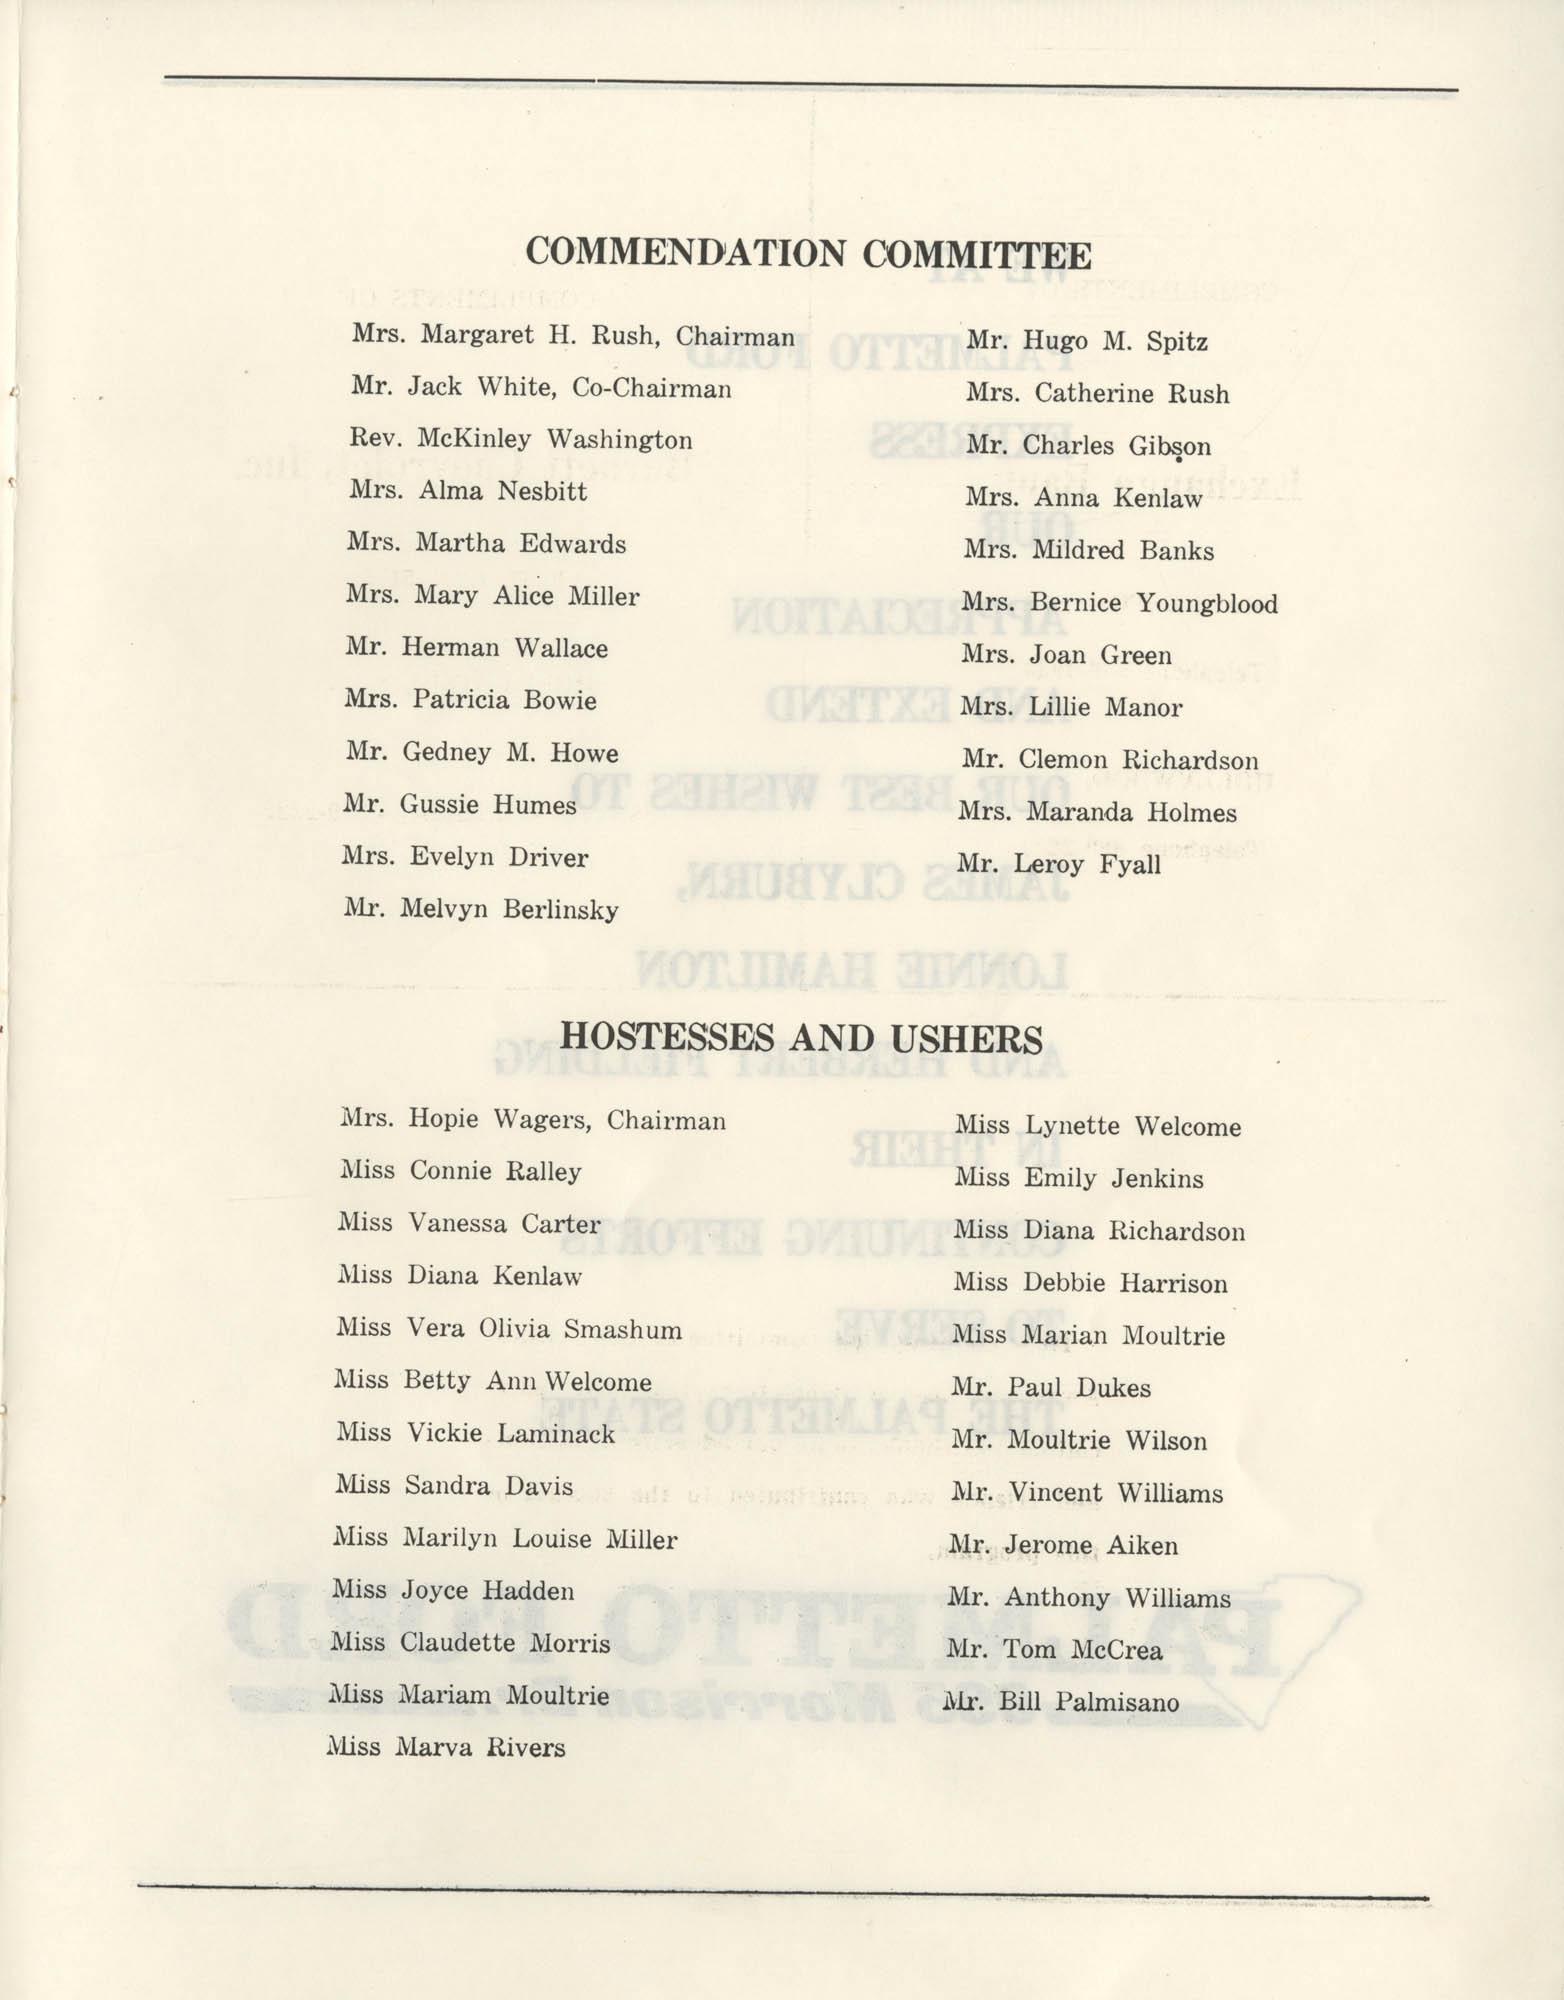 1972 Appreciation Dinner Program, Page 17